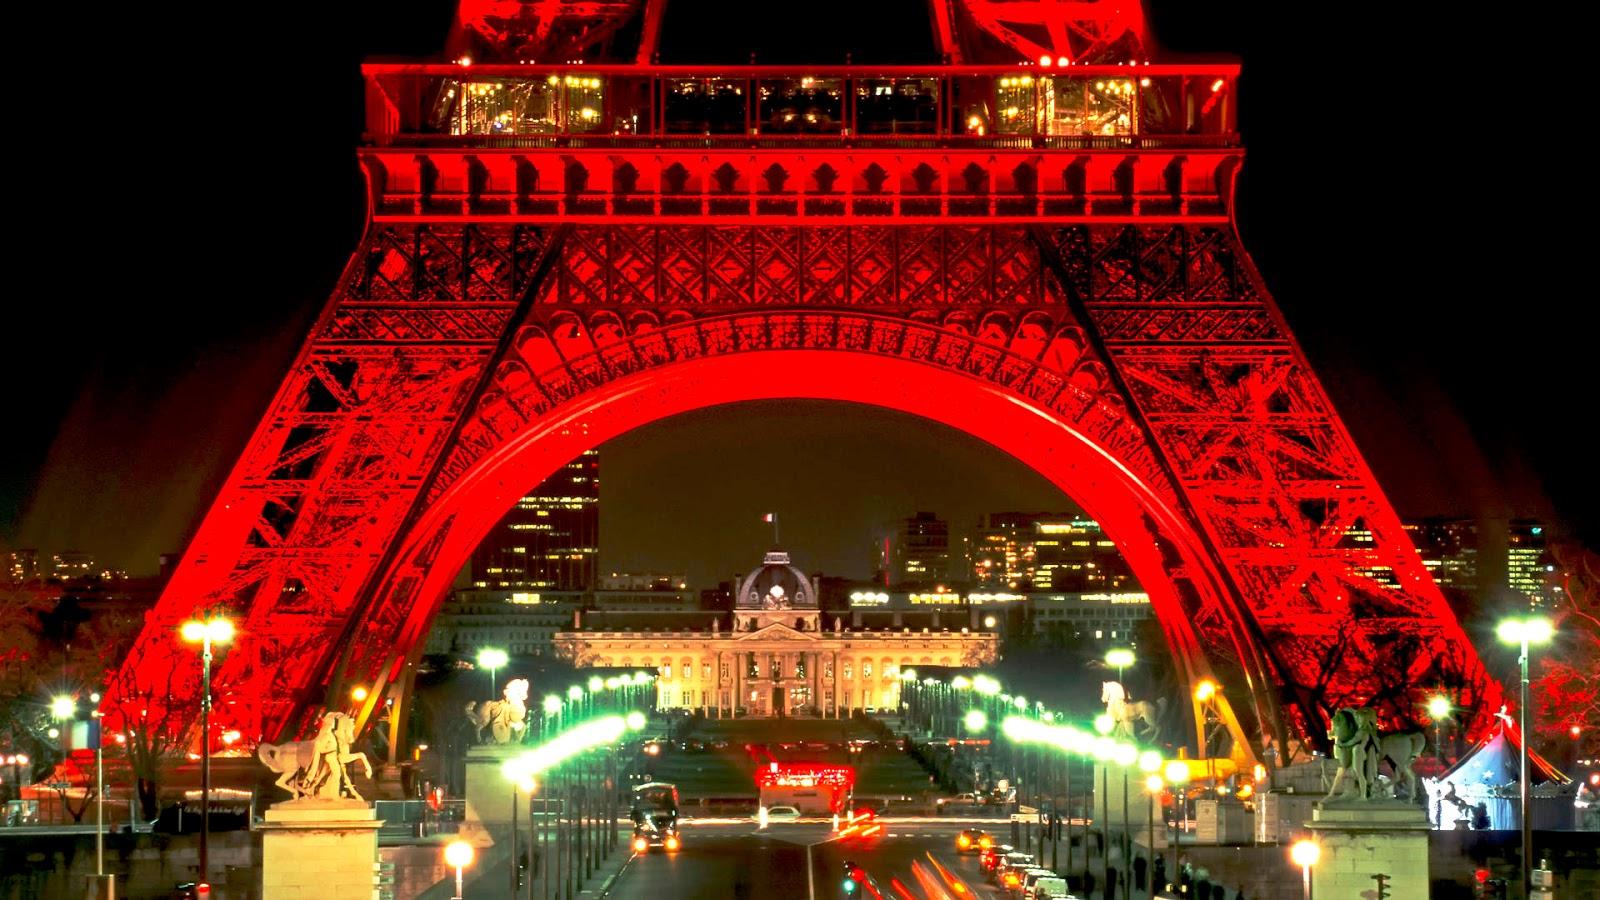 Eiffel Tower Christmas Lights